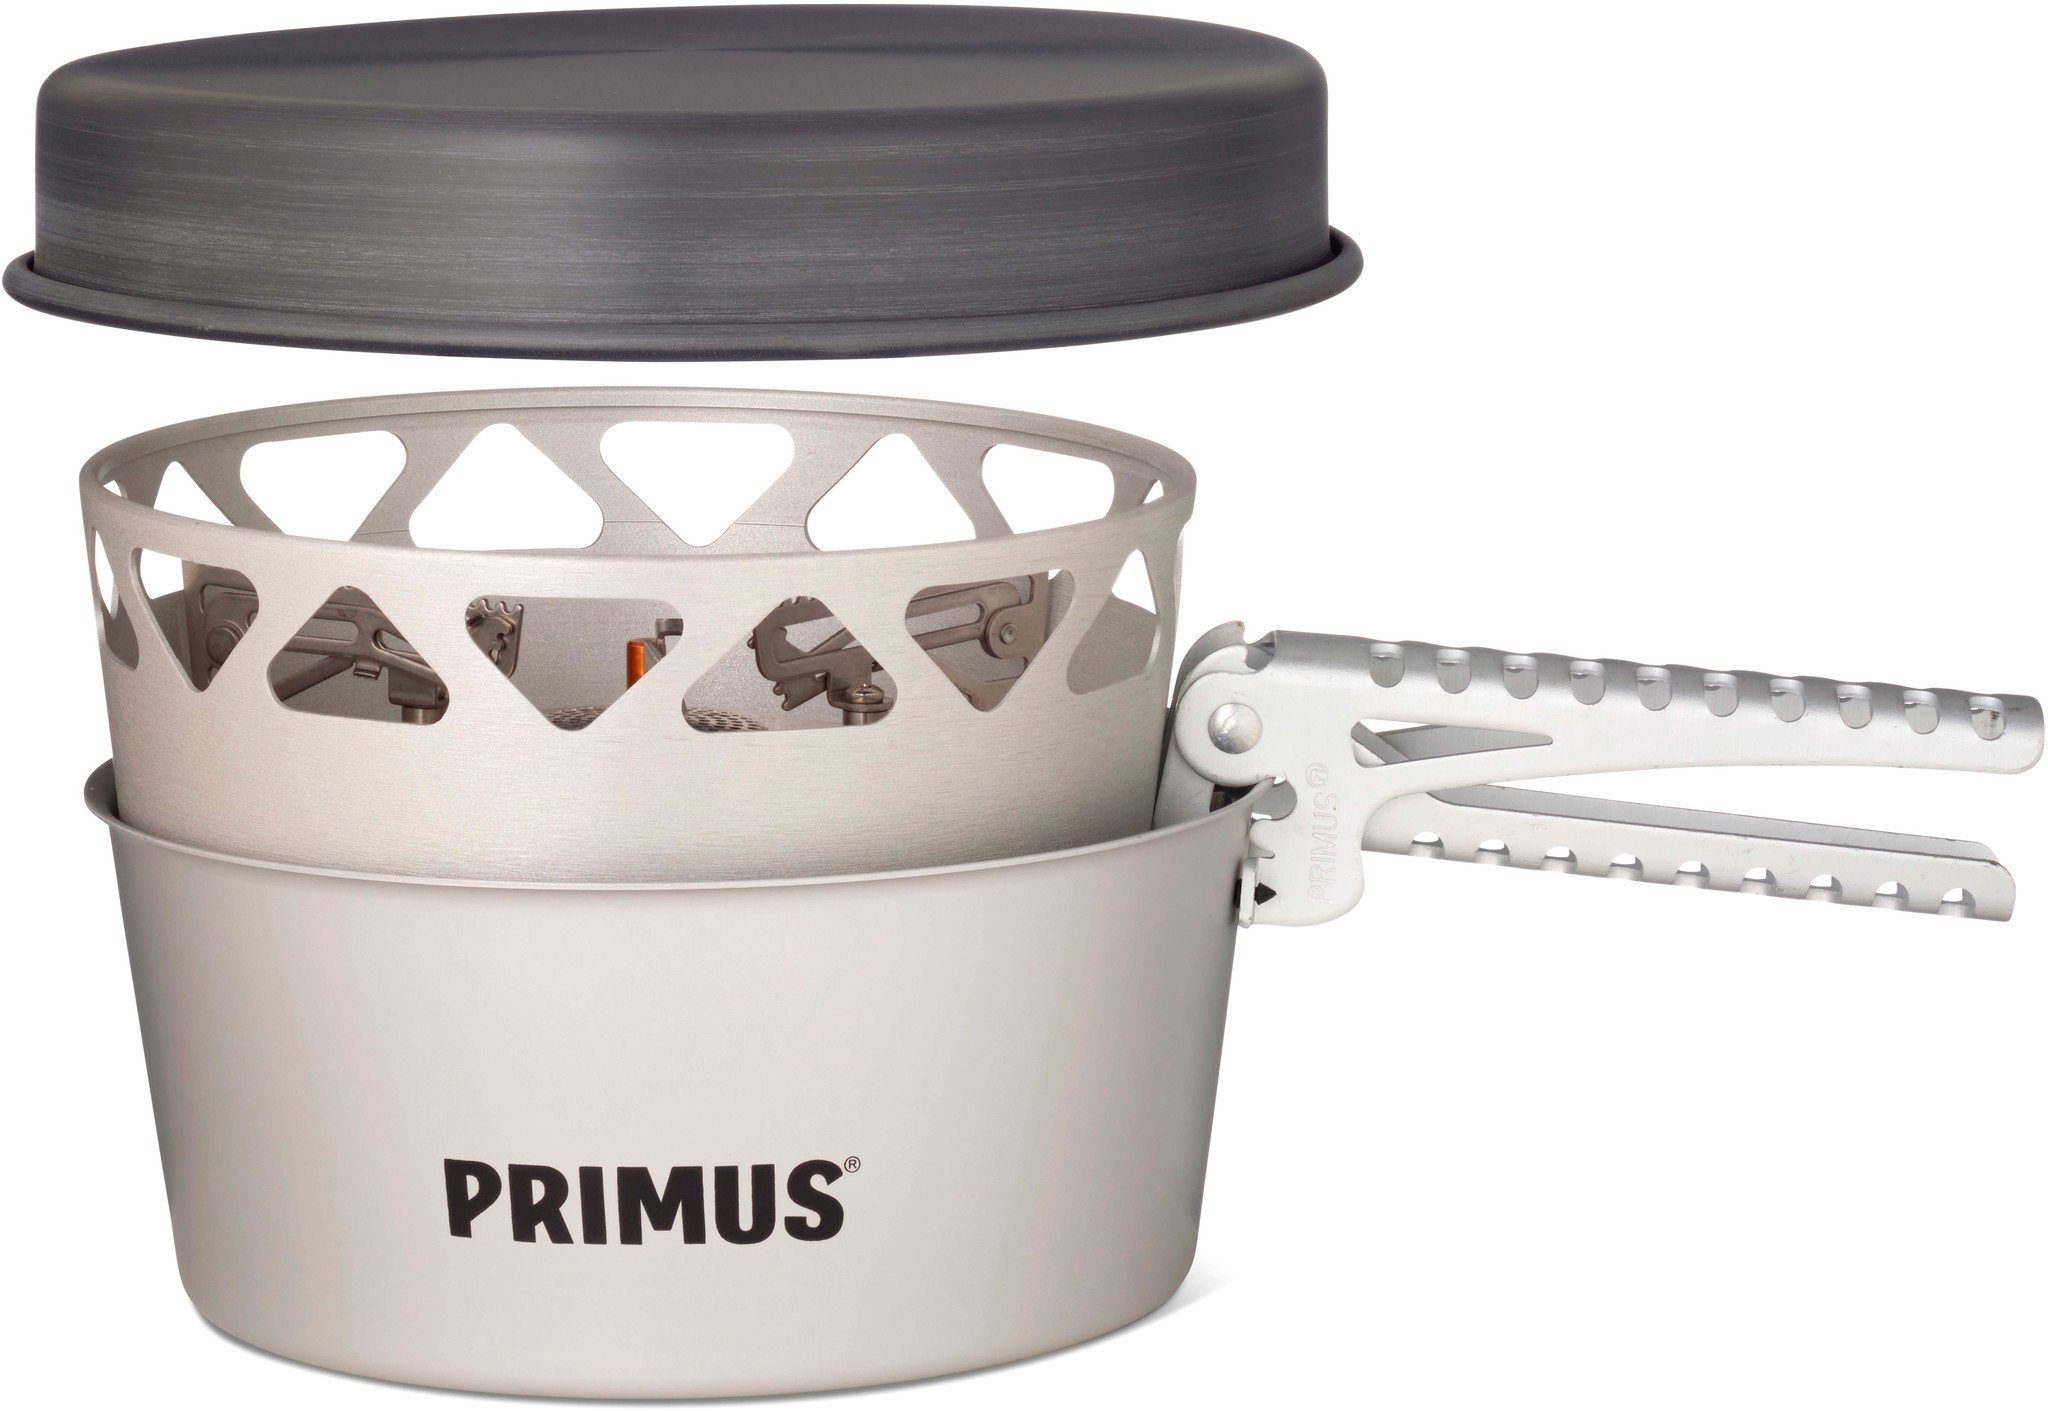 Primus Camping-Kocher »Essential Stove Set 2300ml«